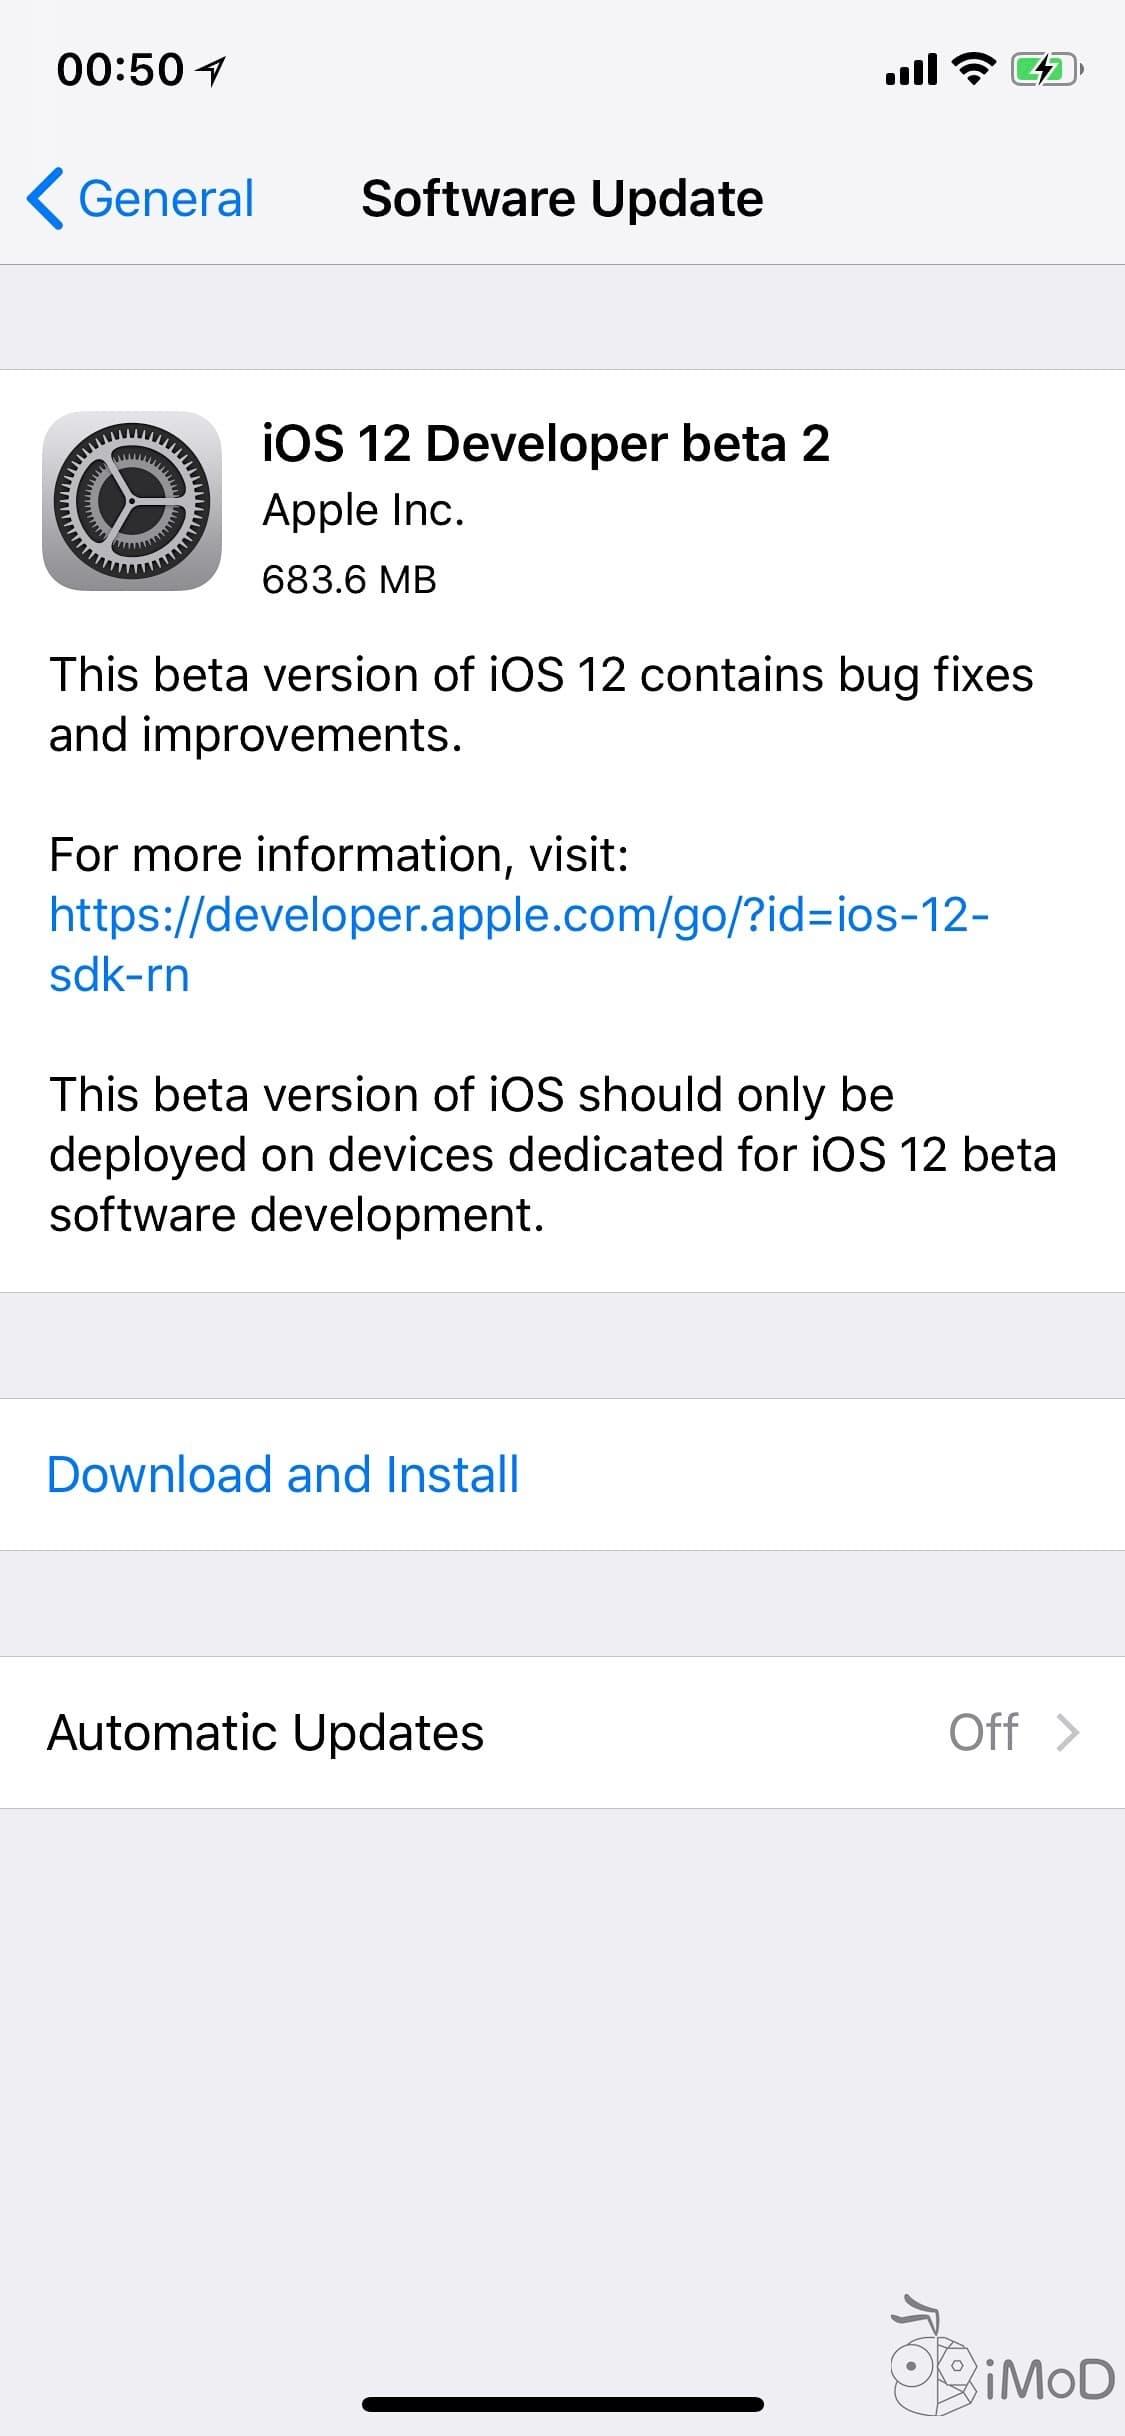 Ios 12 Developer Beta 2